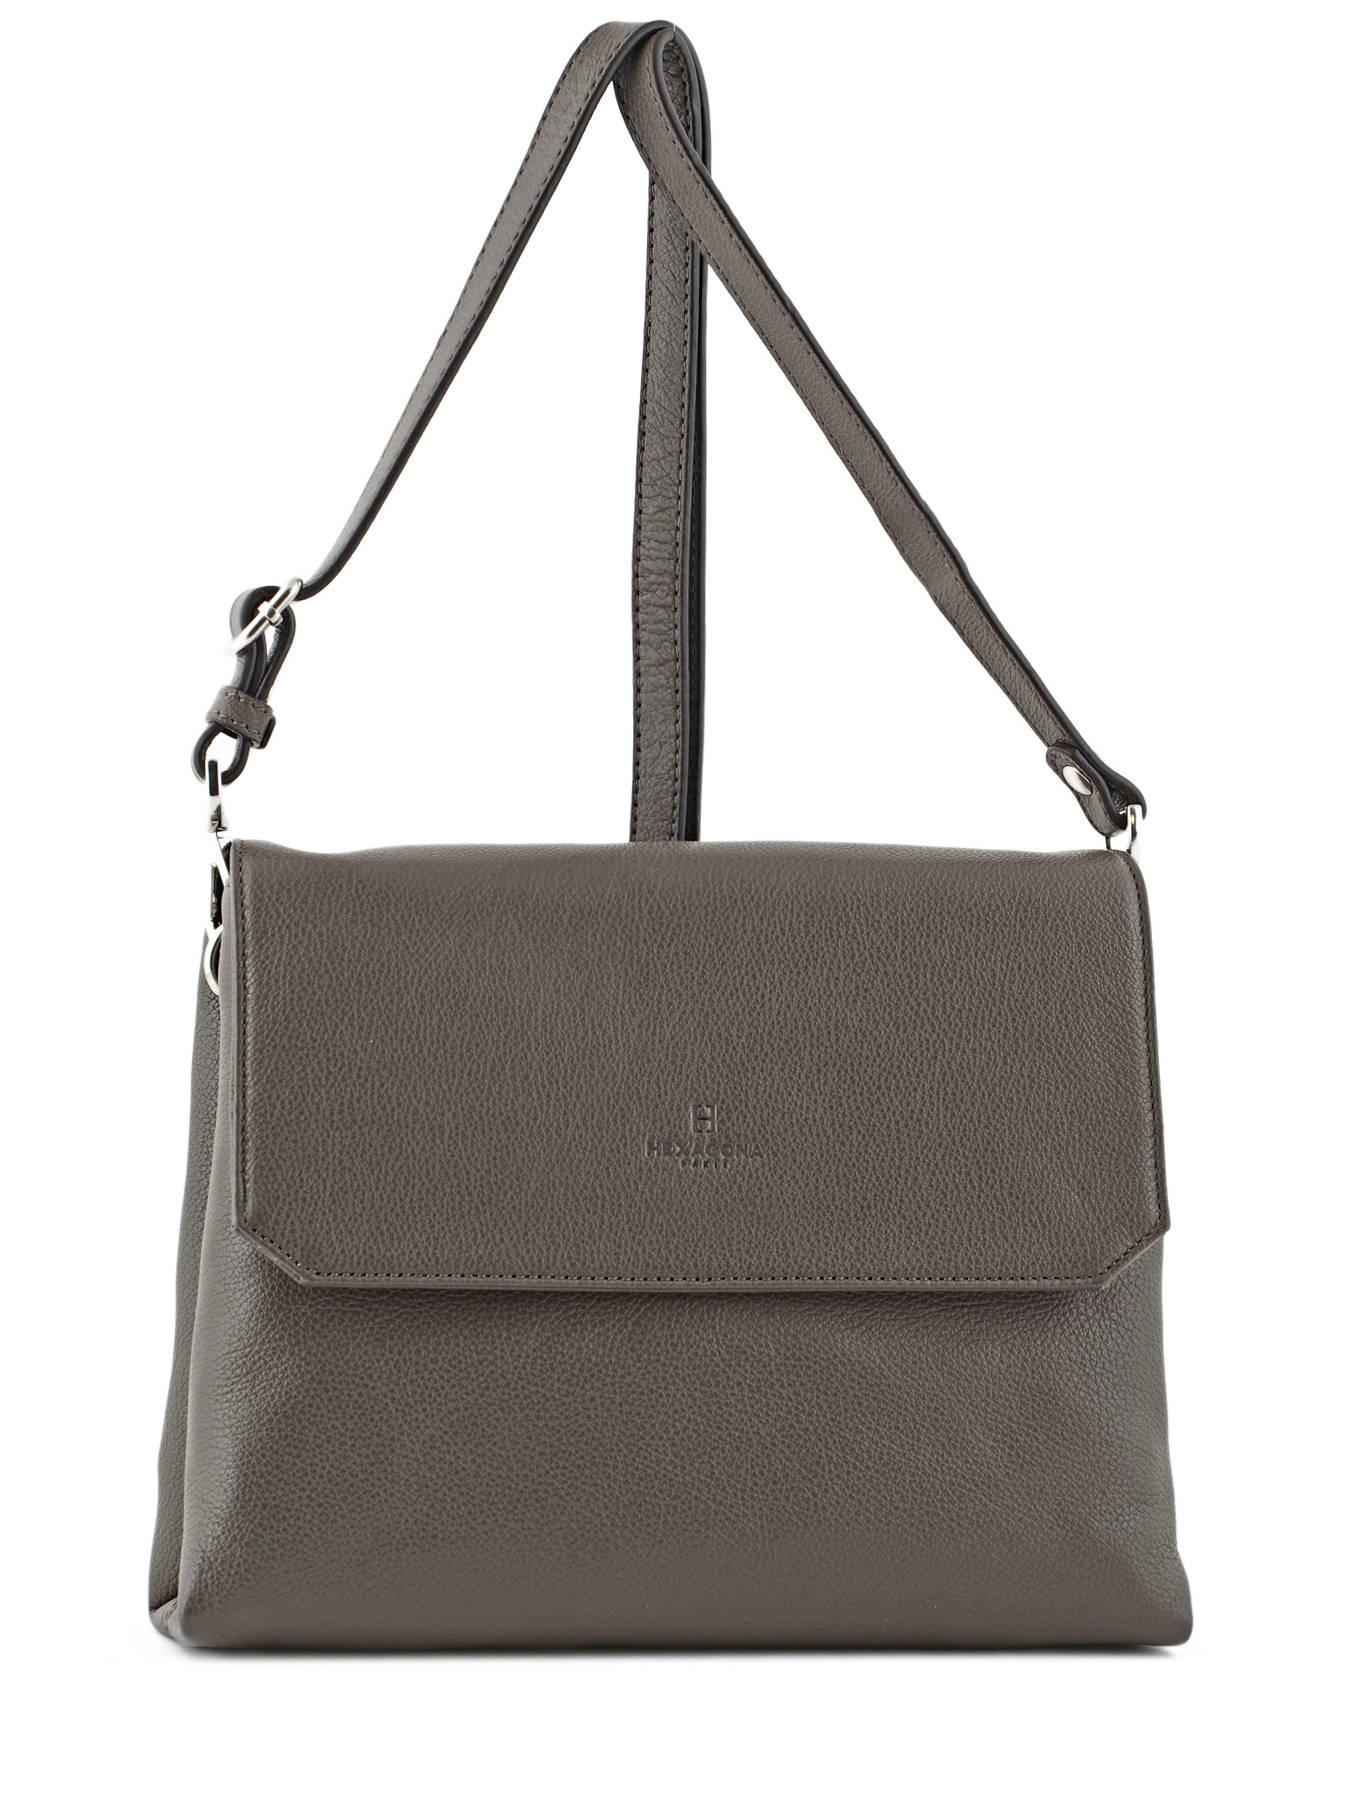 cd9978dd439a Shoulder Bag Pretty Leather Hexagona Brown pretty 465022 … cute shoulder  bags